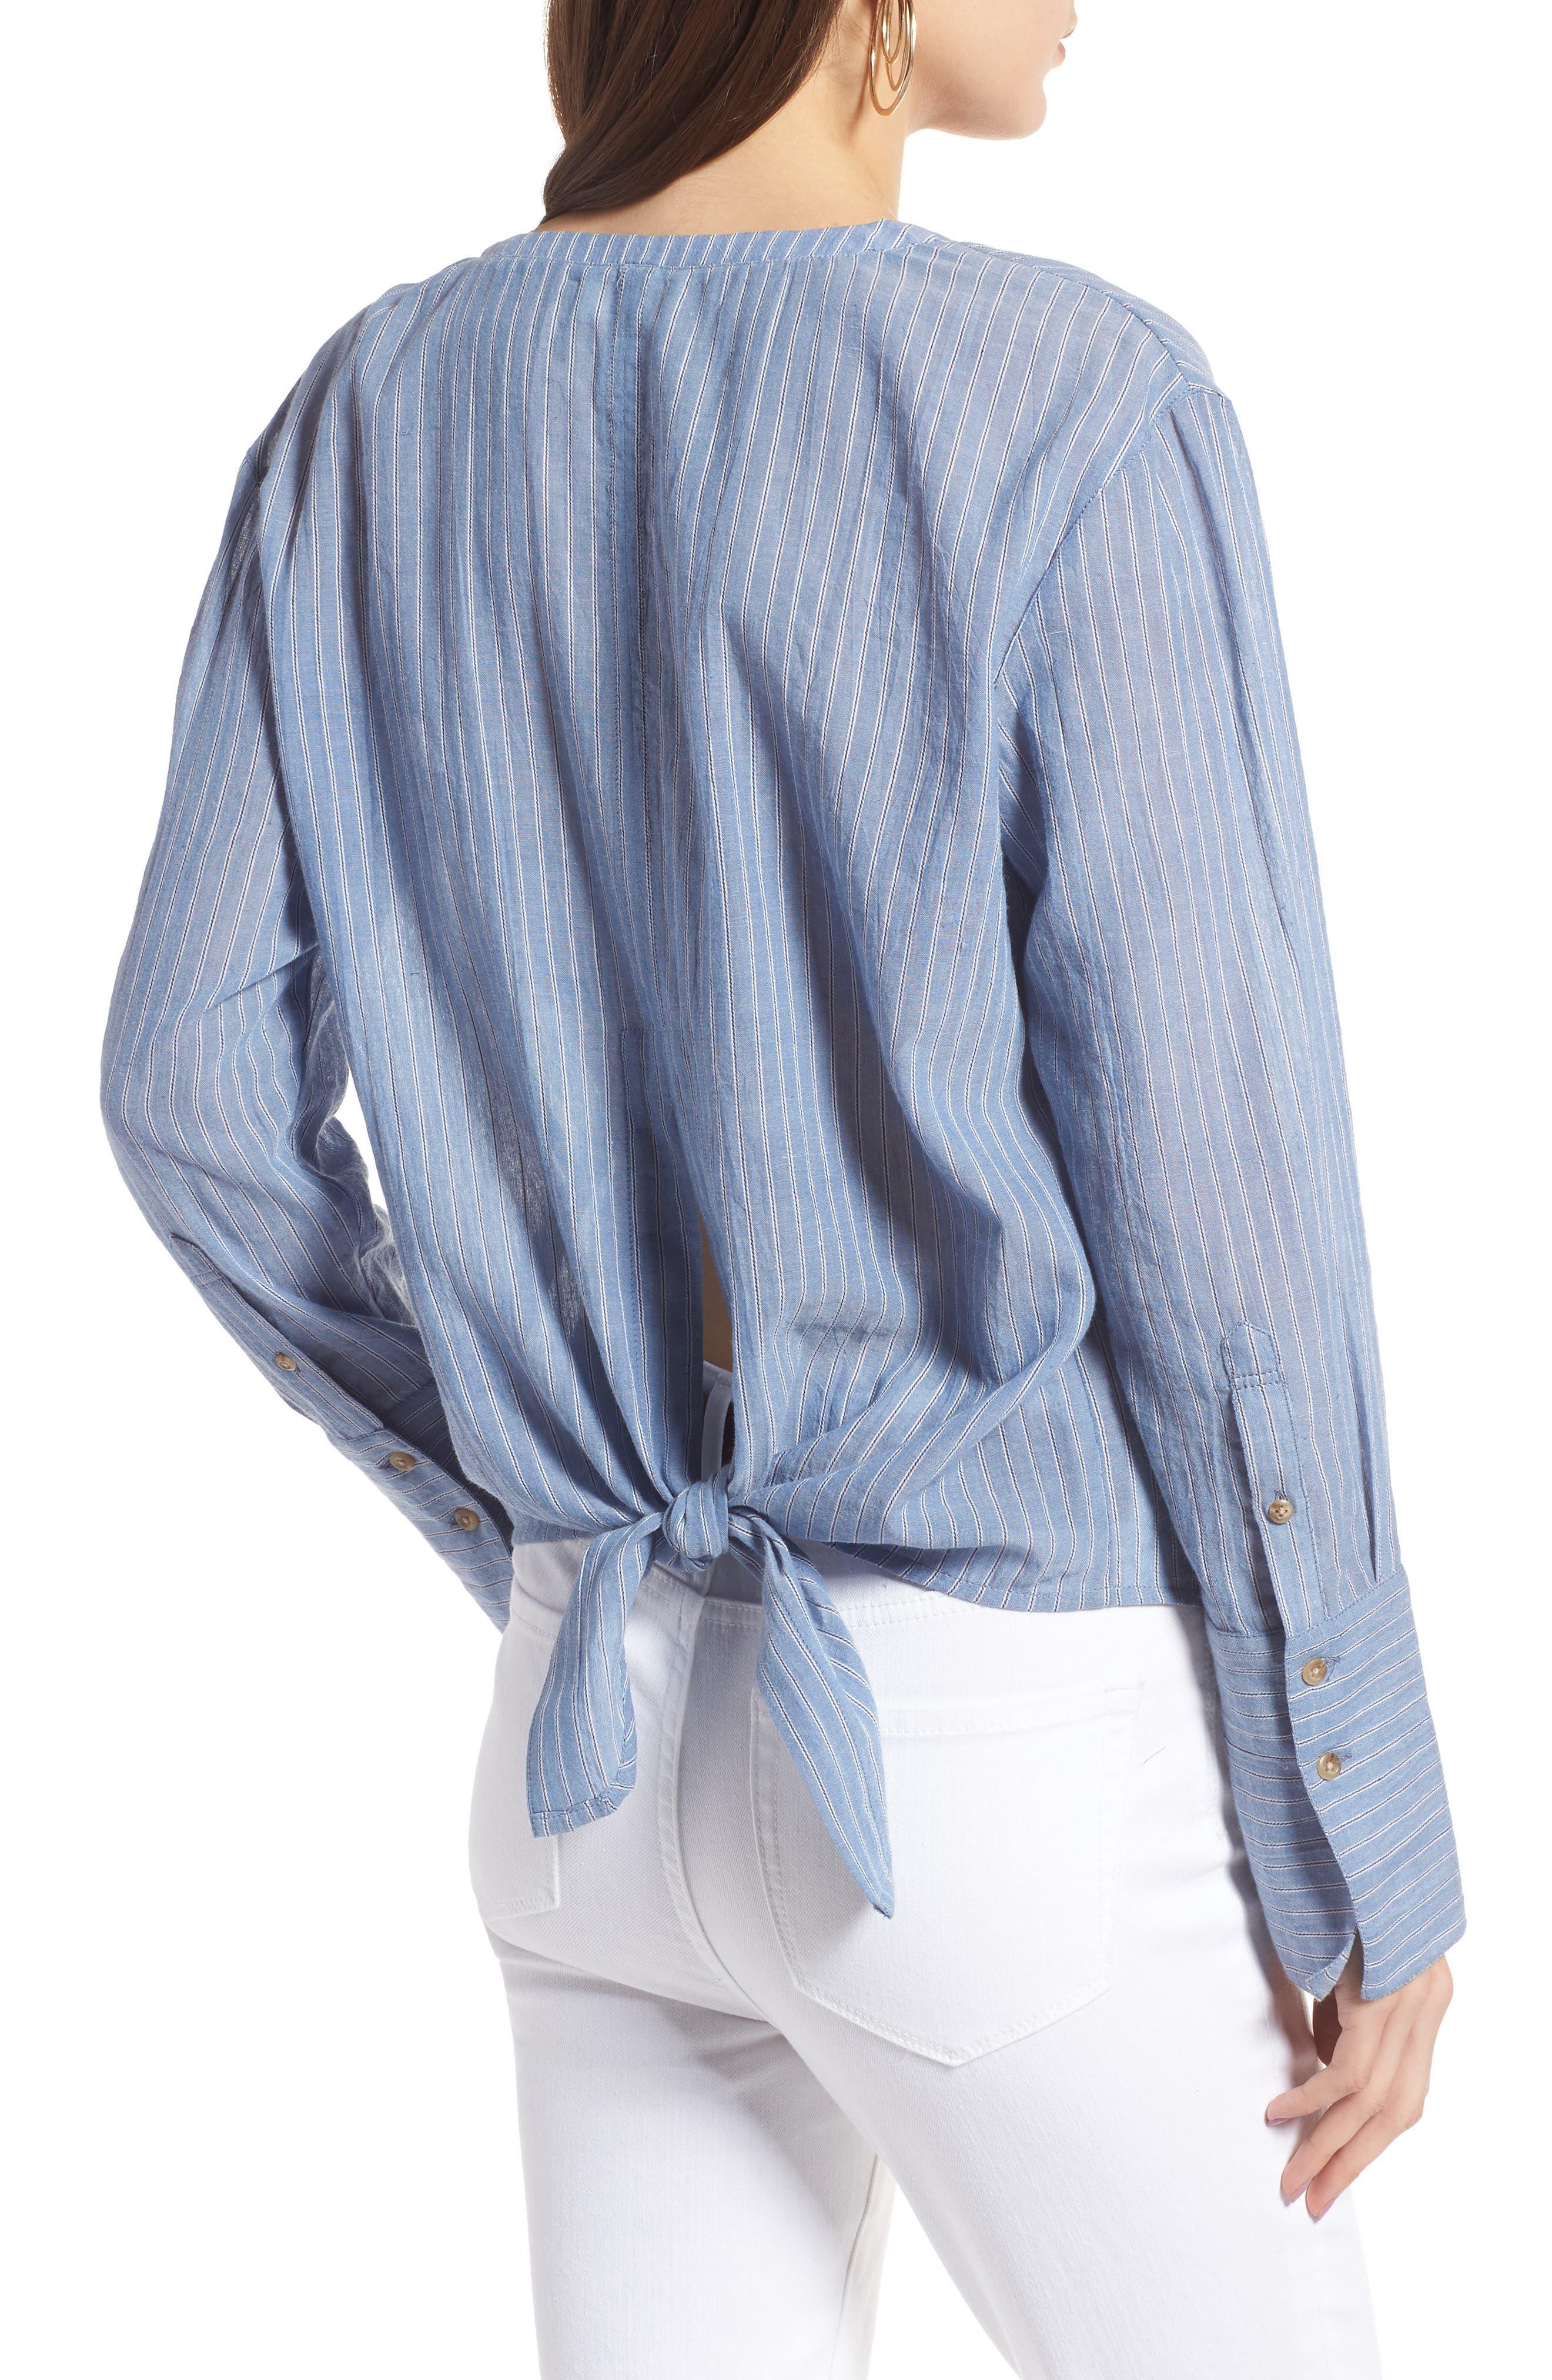 Tie Back Shirt,                             Alternate thumbnail 2, color,                             Blue Airy Stripe